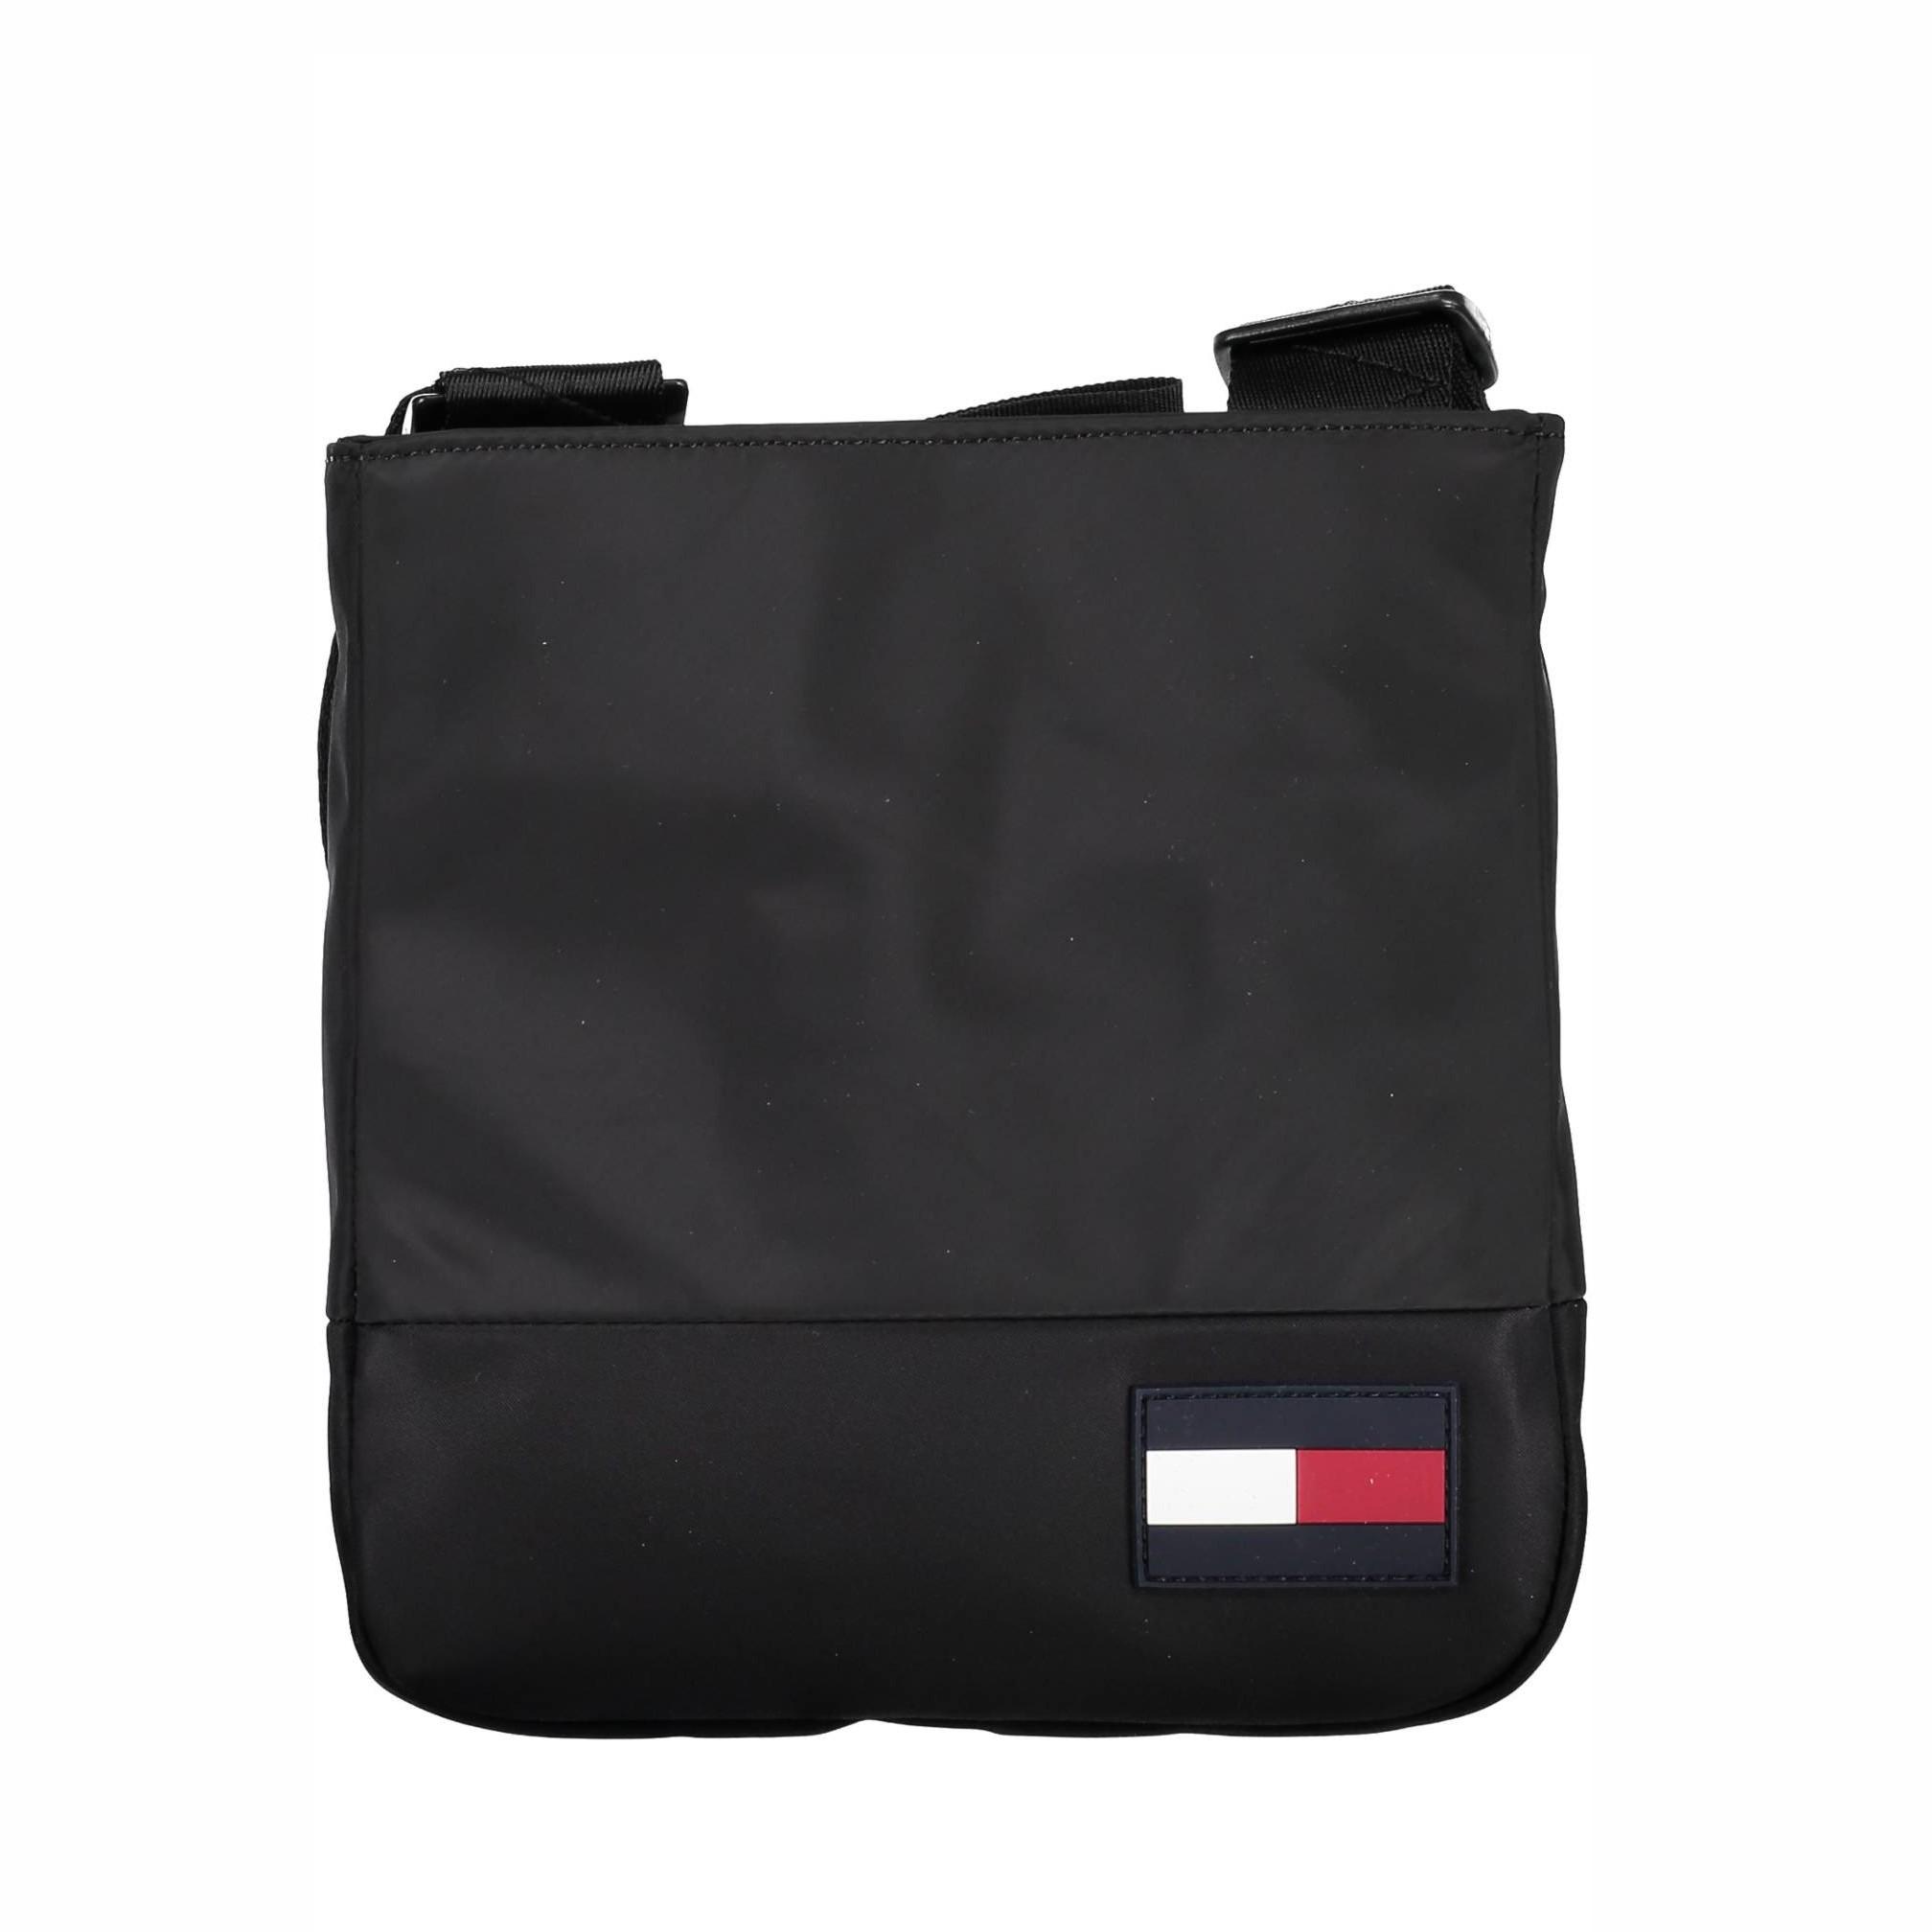 Pánska taška Tommy Hilfiger crossbody GF400 black  4c6d7e5f1f8